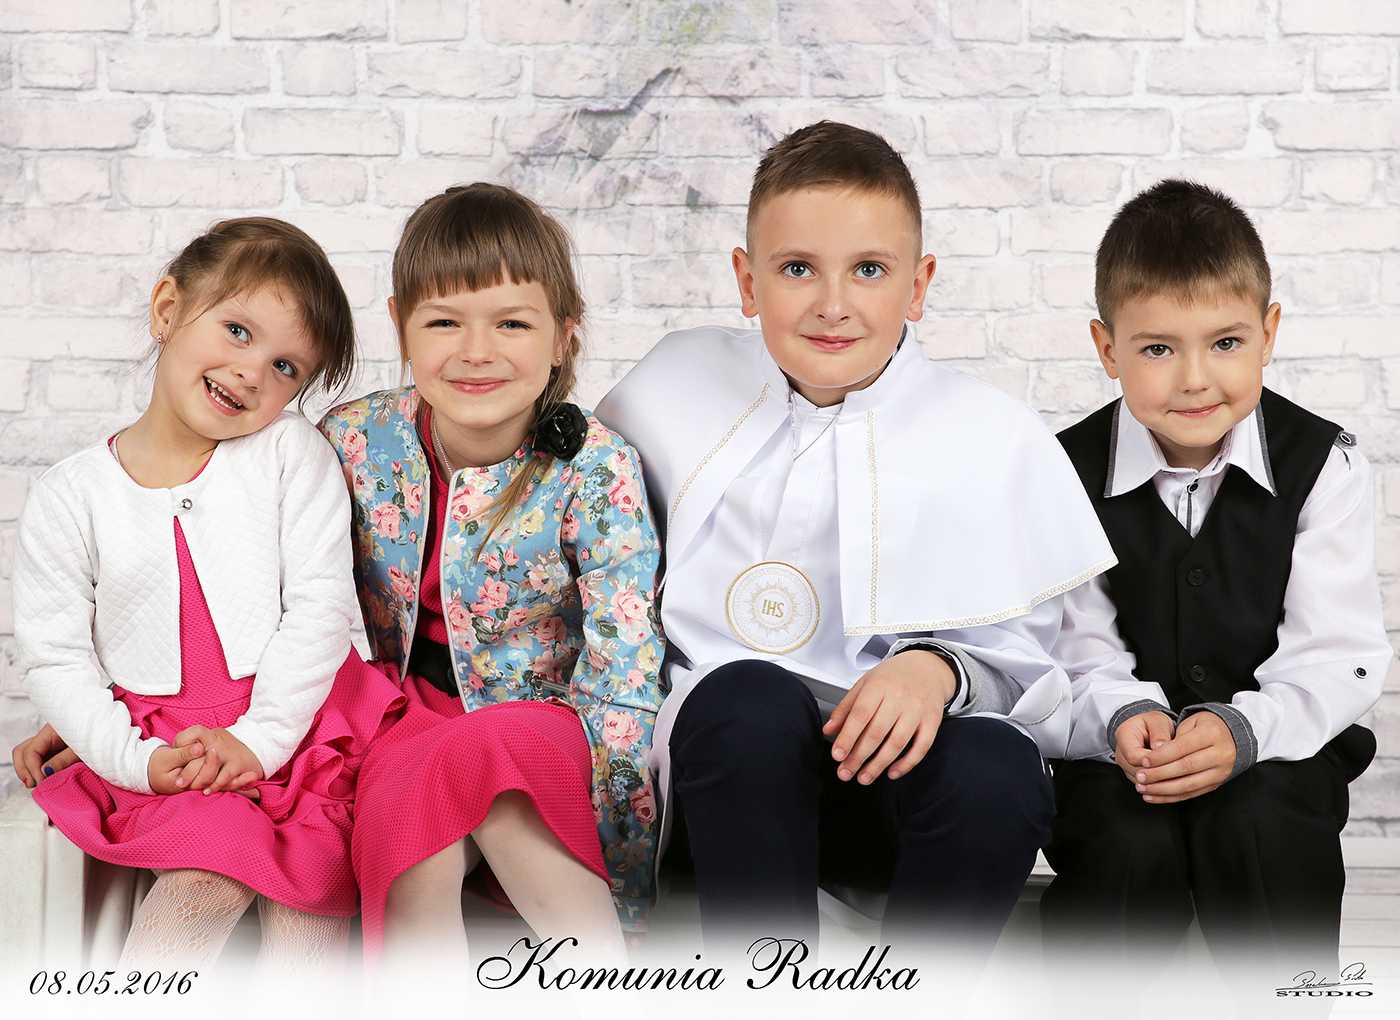 Komunia 2016